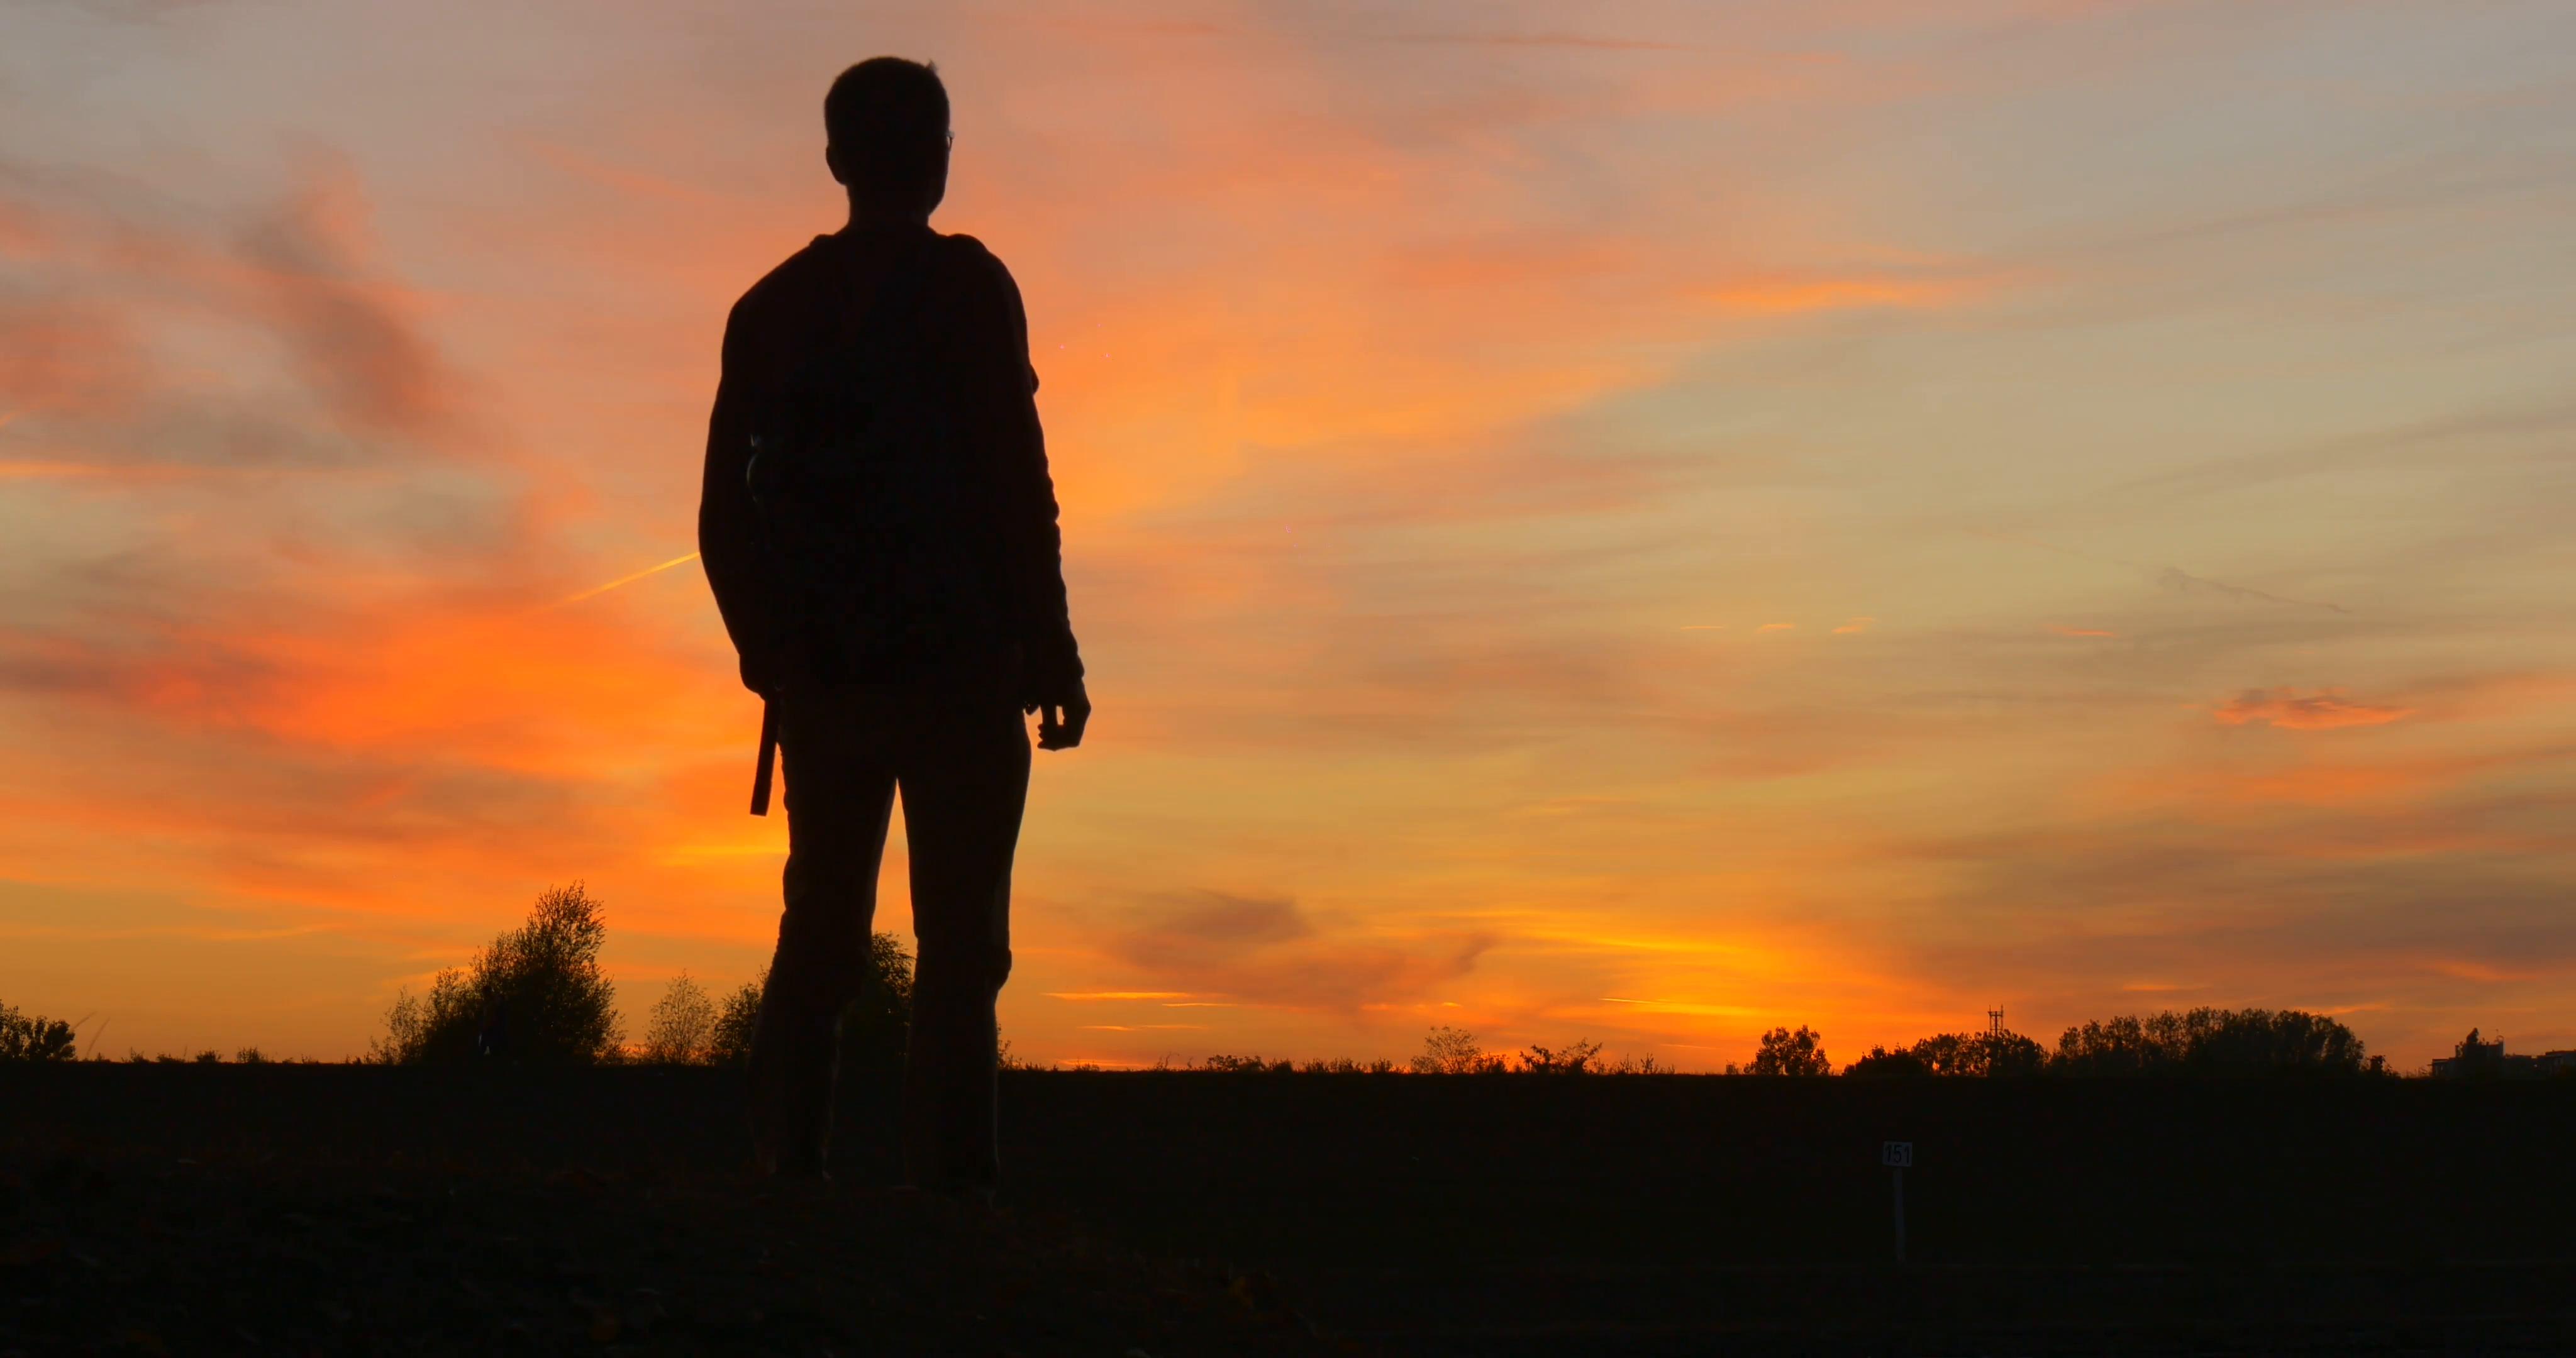 Sunset Silhouette Man.